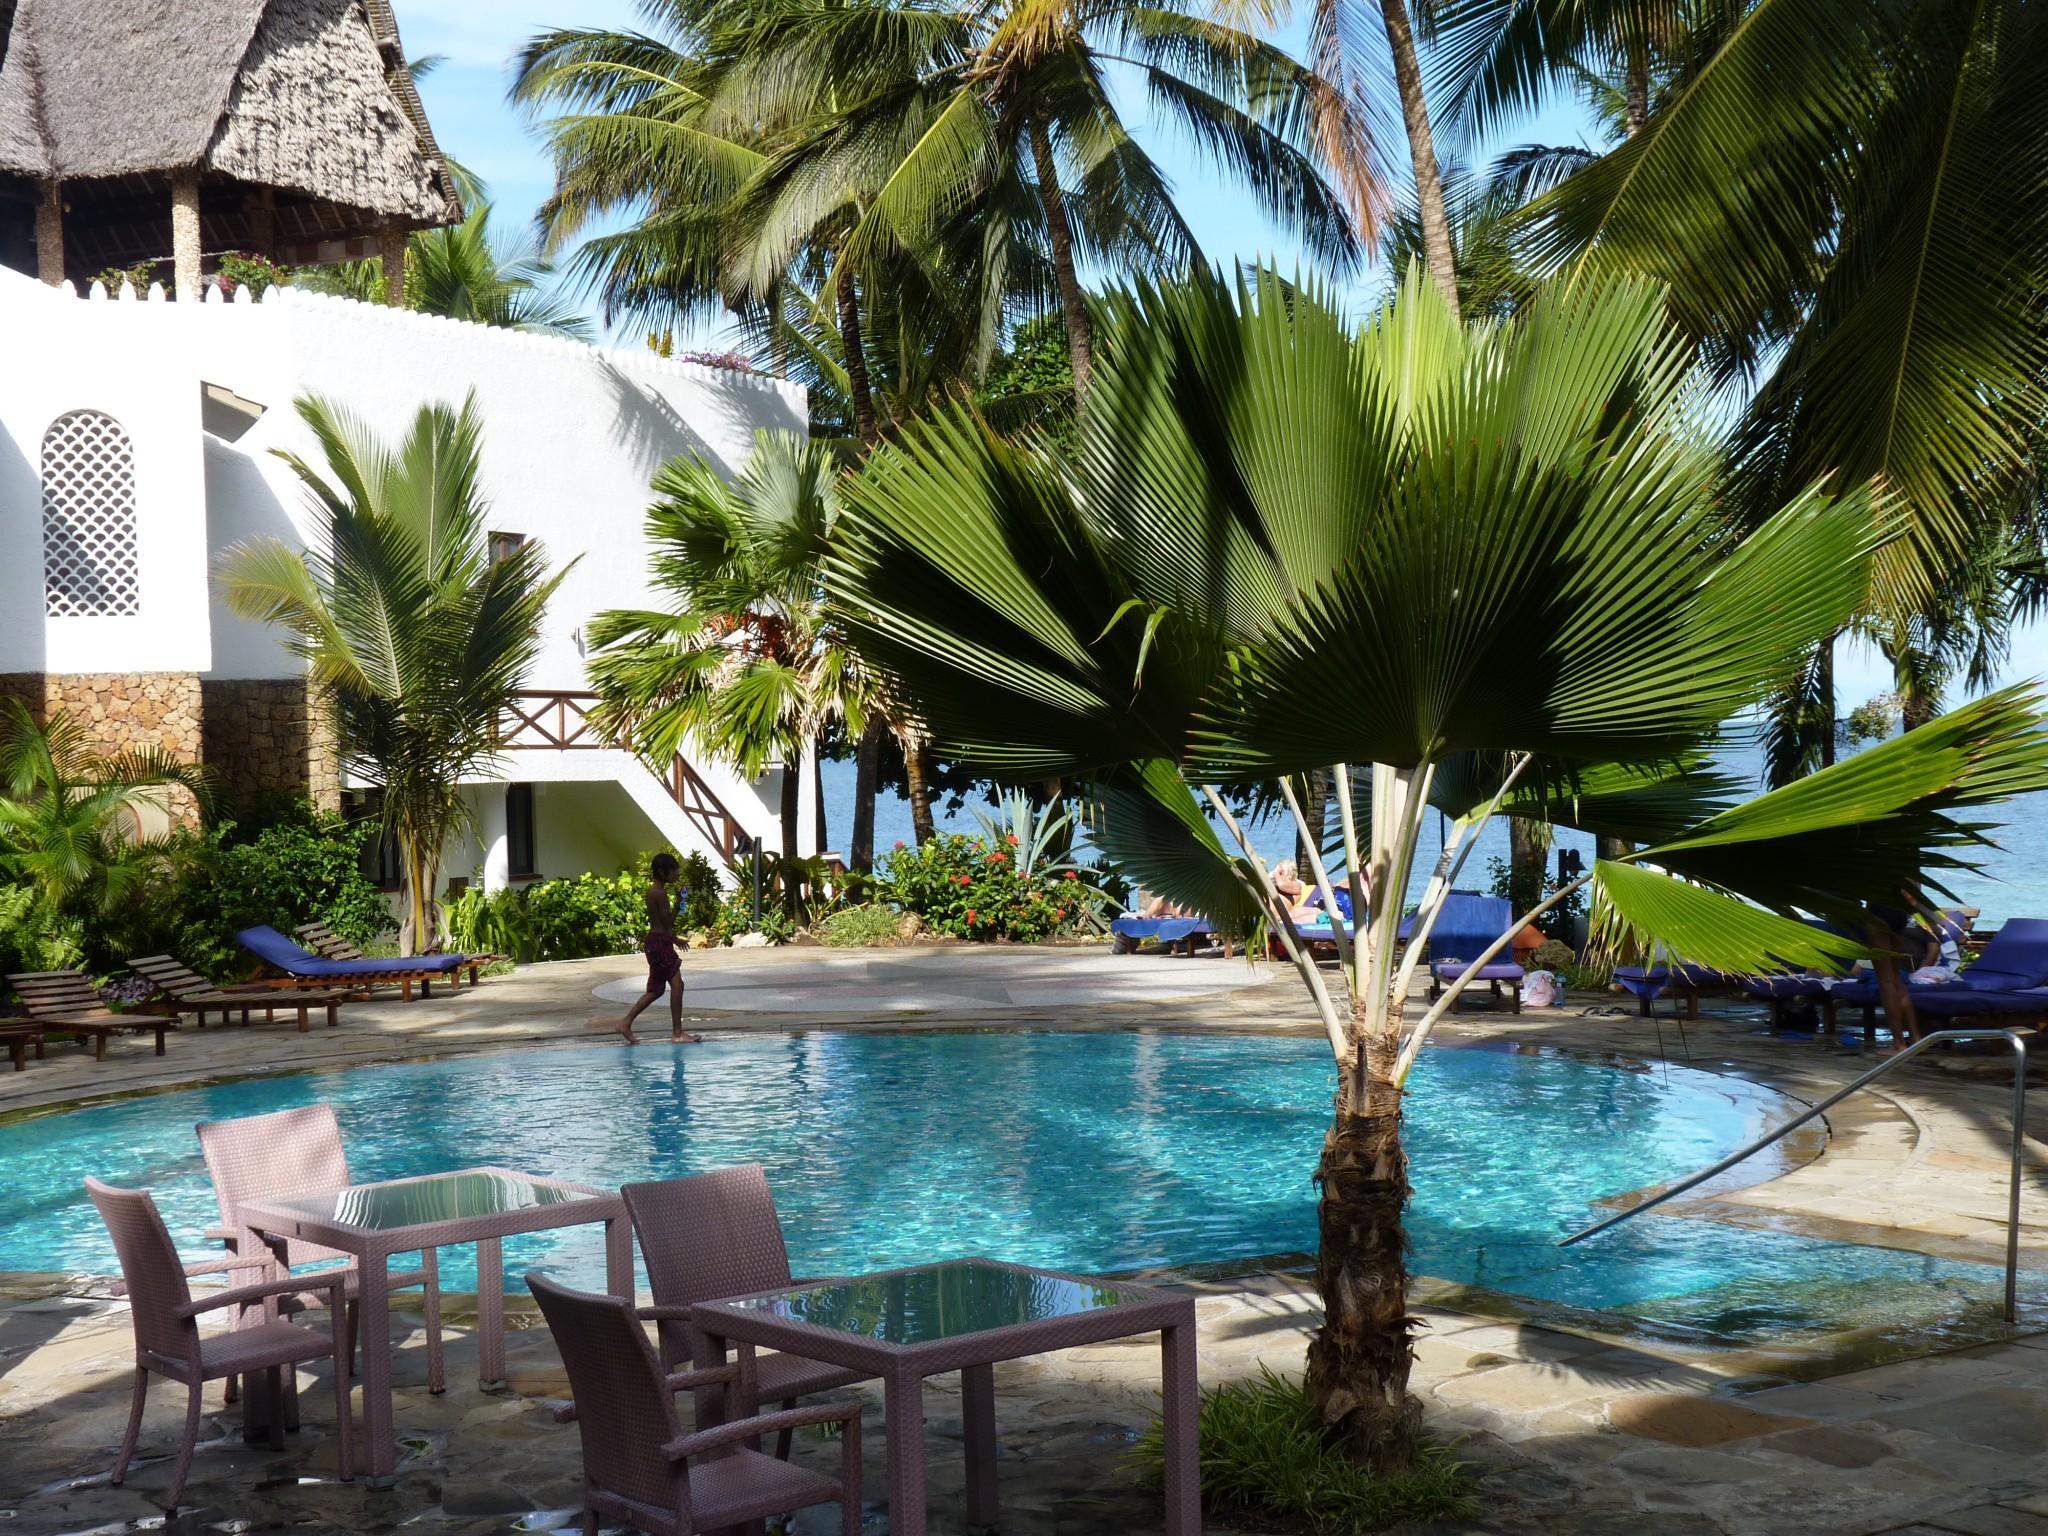 Severin Sea Lodge Kenia